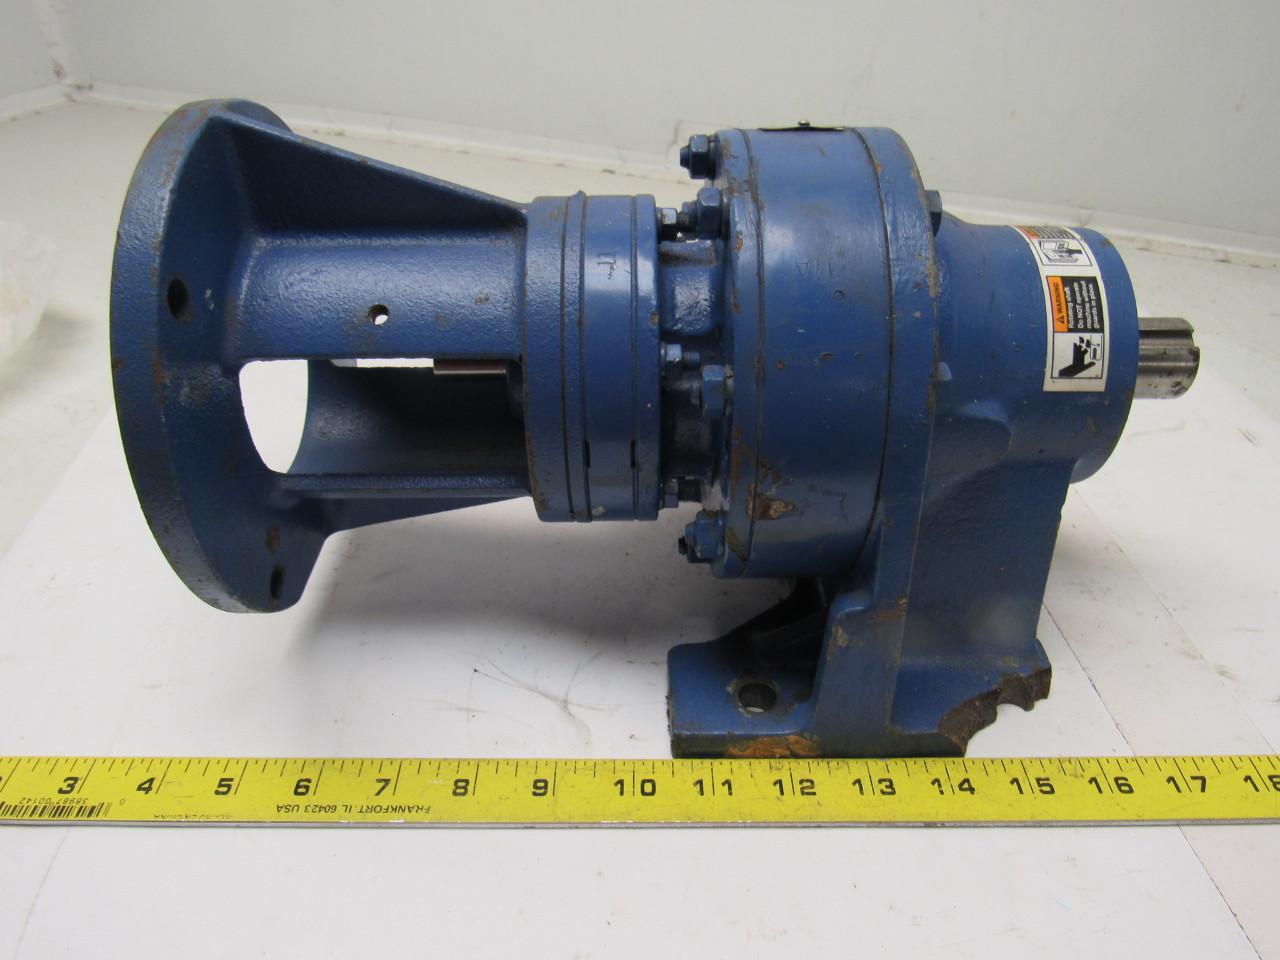 Sumitomo SM-Cyclo CNHJ-4105DAY-187 Inline Gear Reducer 167:1 Ratio 0.38 Hp